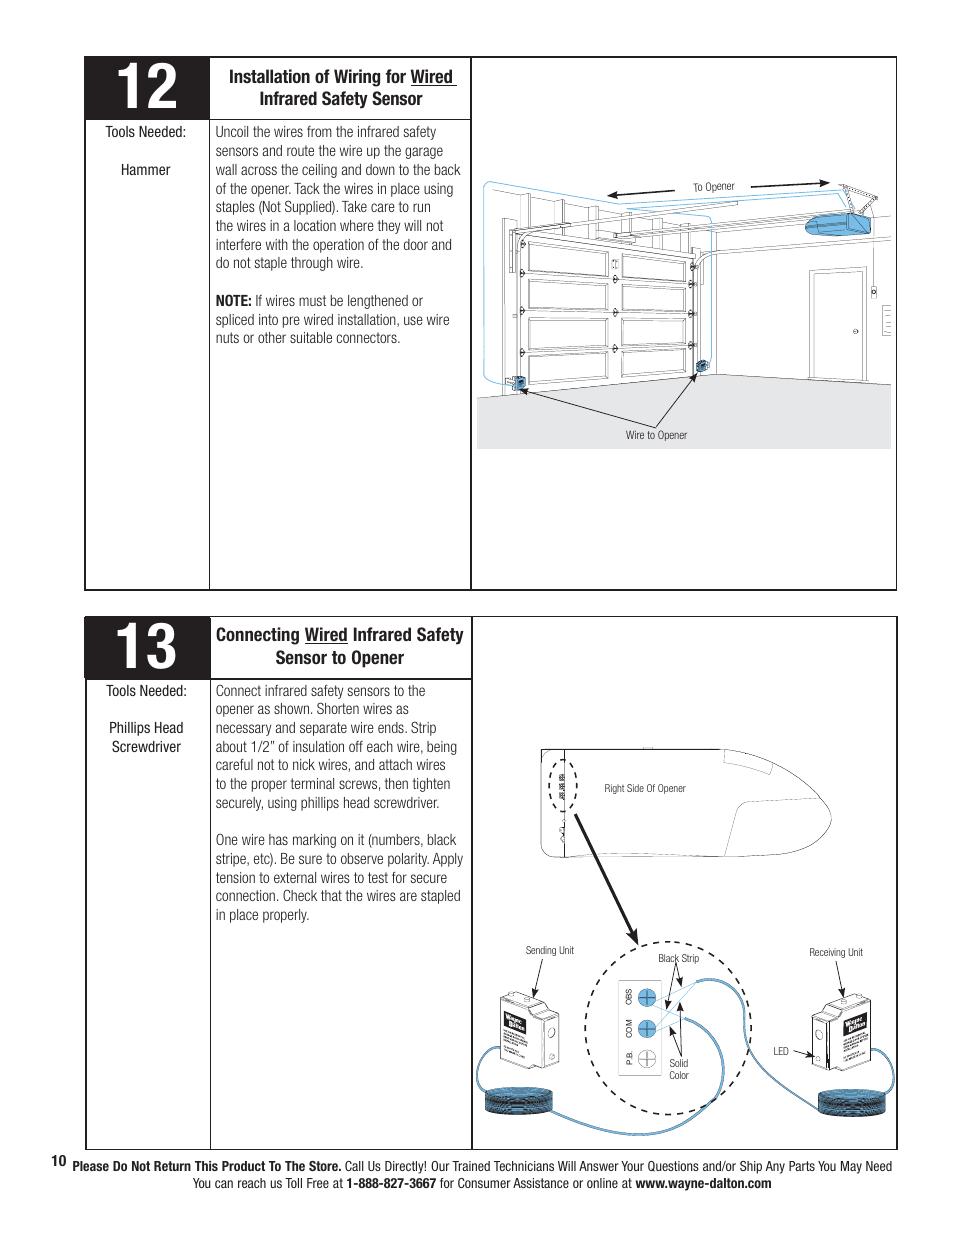 hight resolution of wayne dalton prodrive 3222c z user manual page 16 48 also for wayne dalton idrive wiring diagram wayne dalton wiring diagram